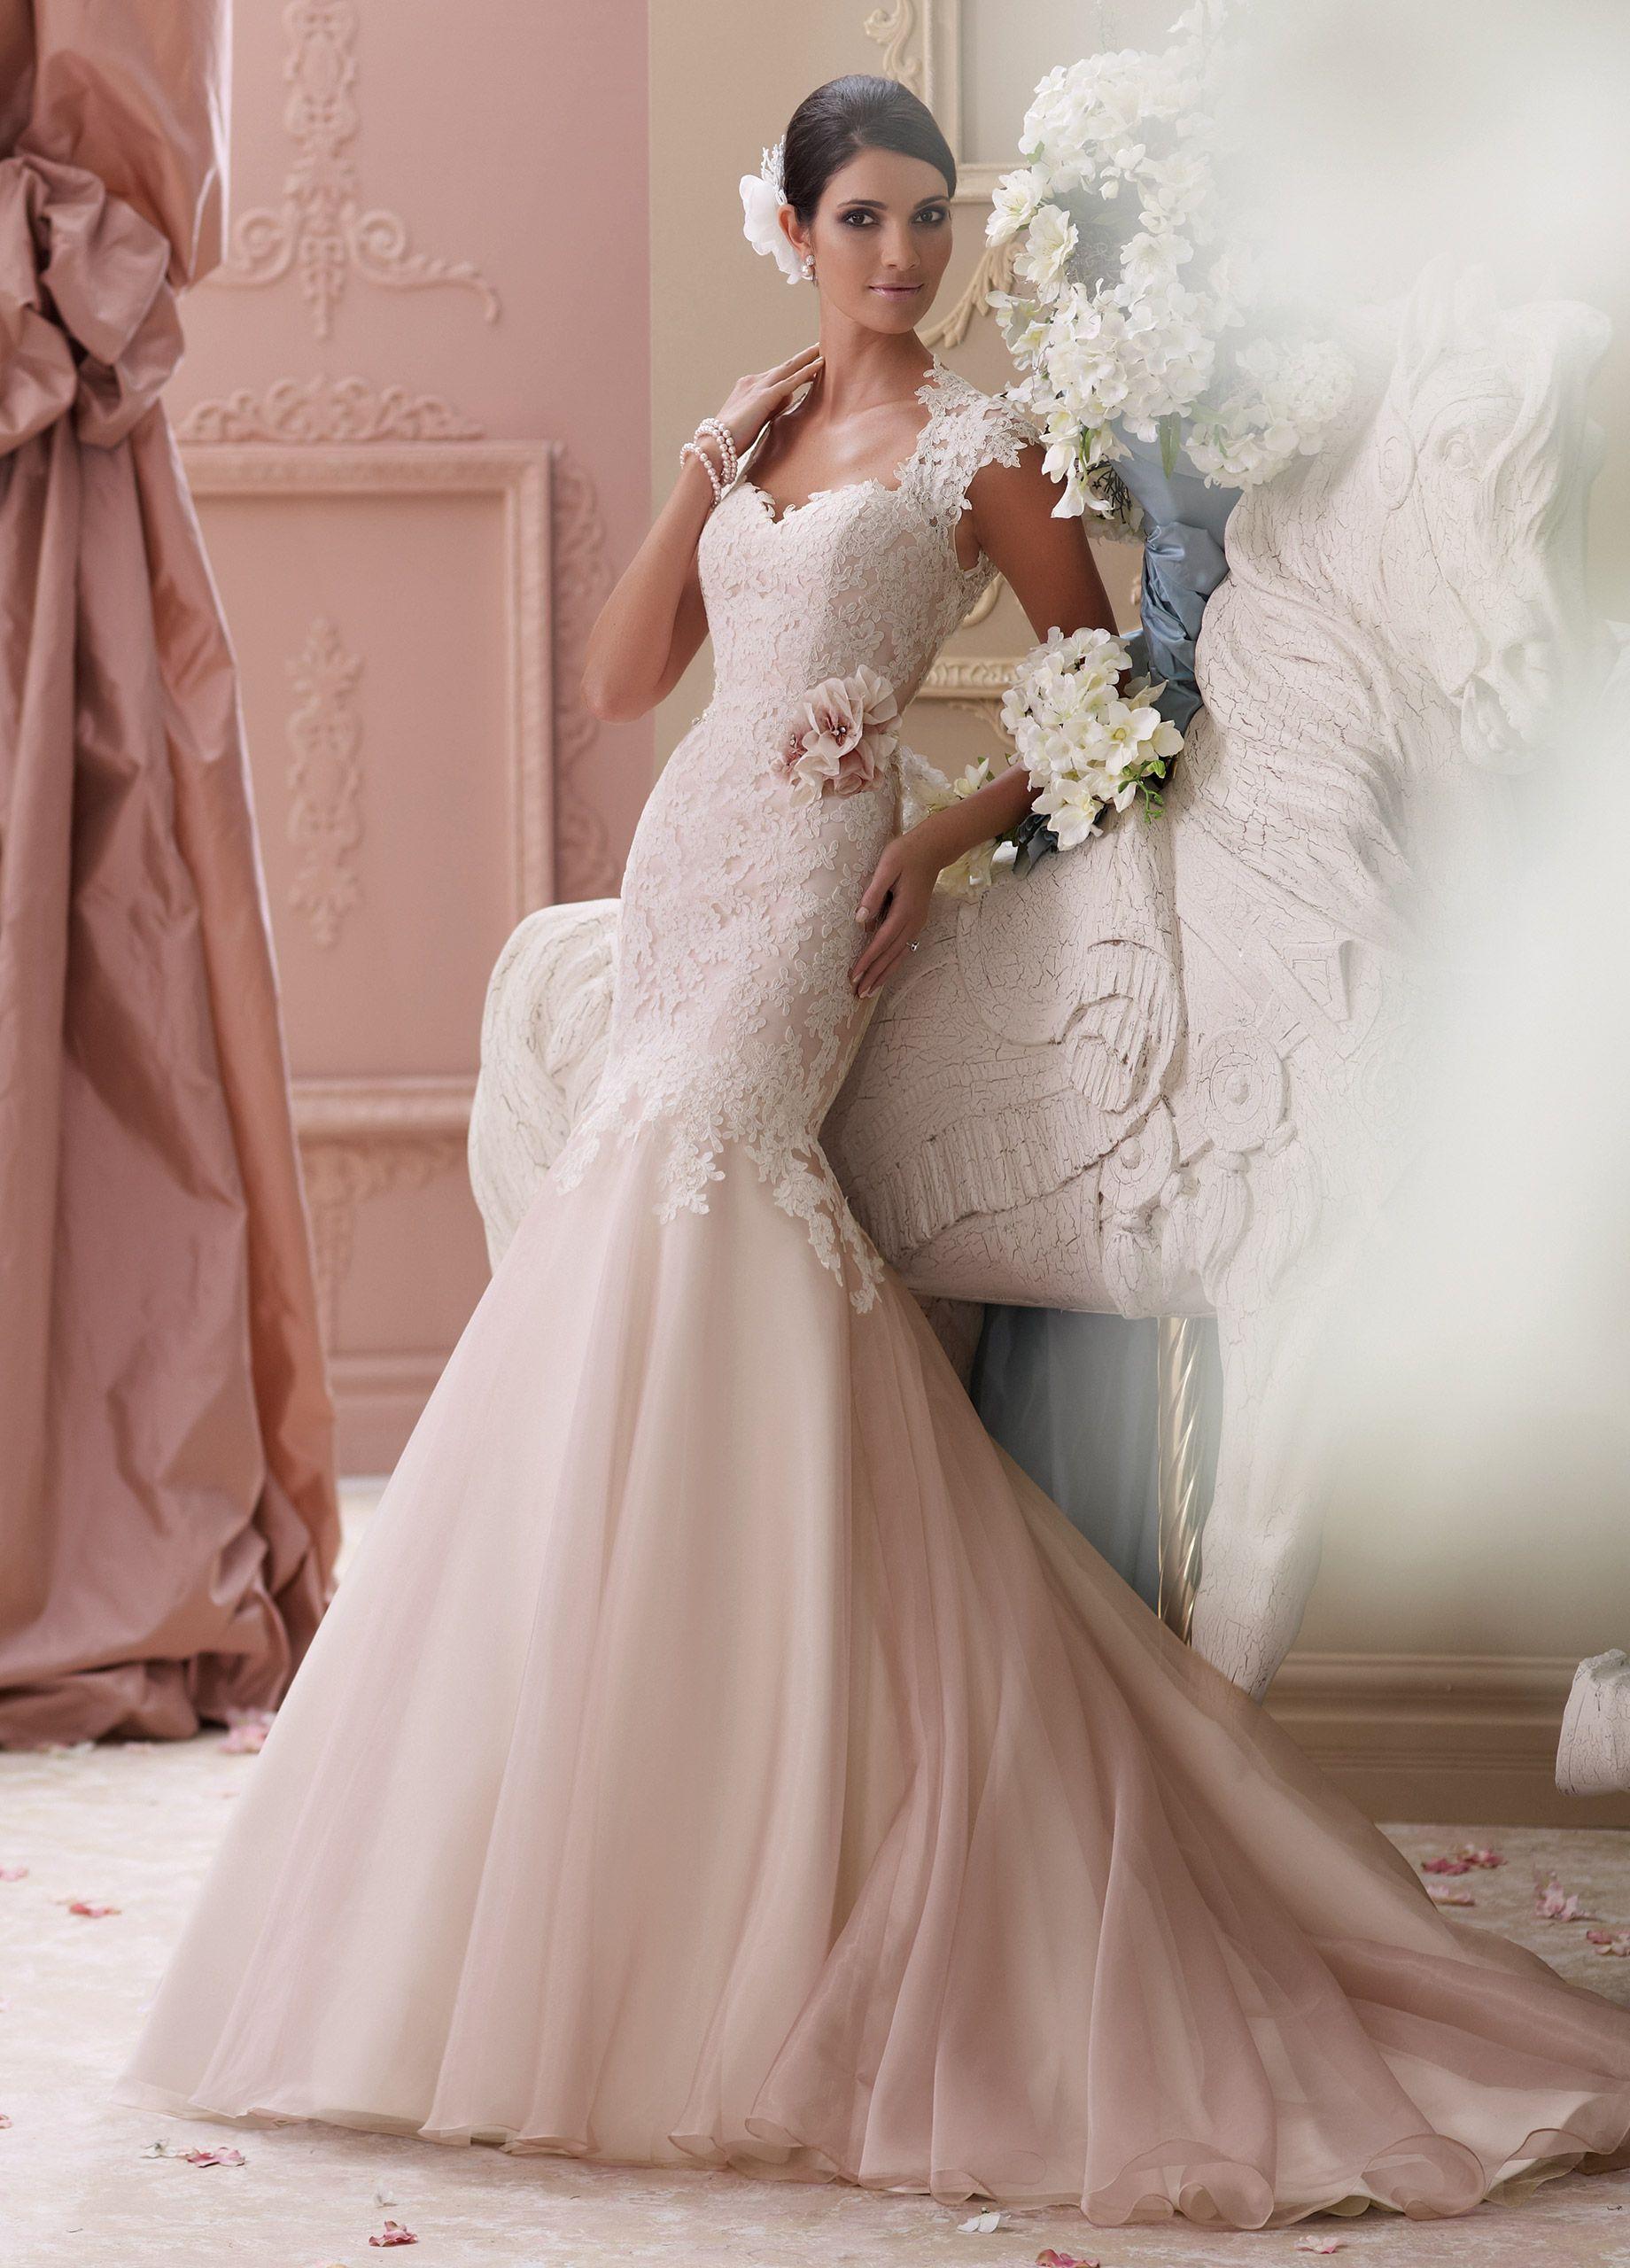 Unique Wedding Dresses Fall 2018 - Martin Thornburg | Wedding ...